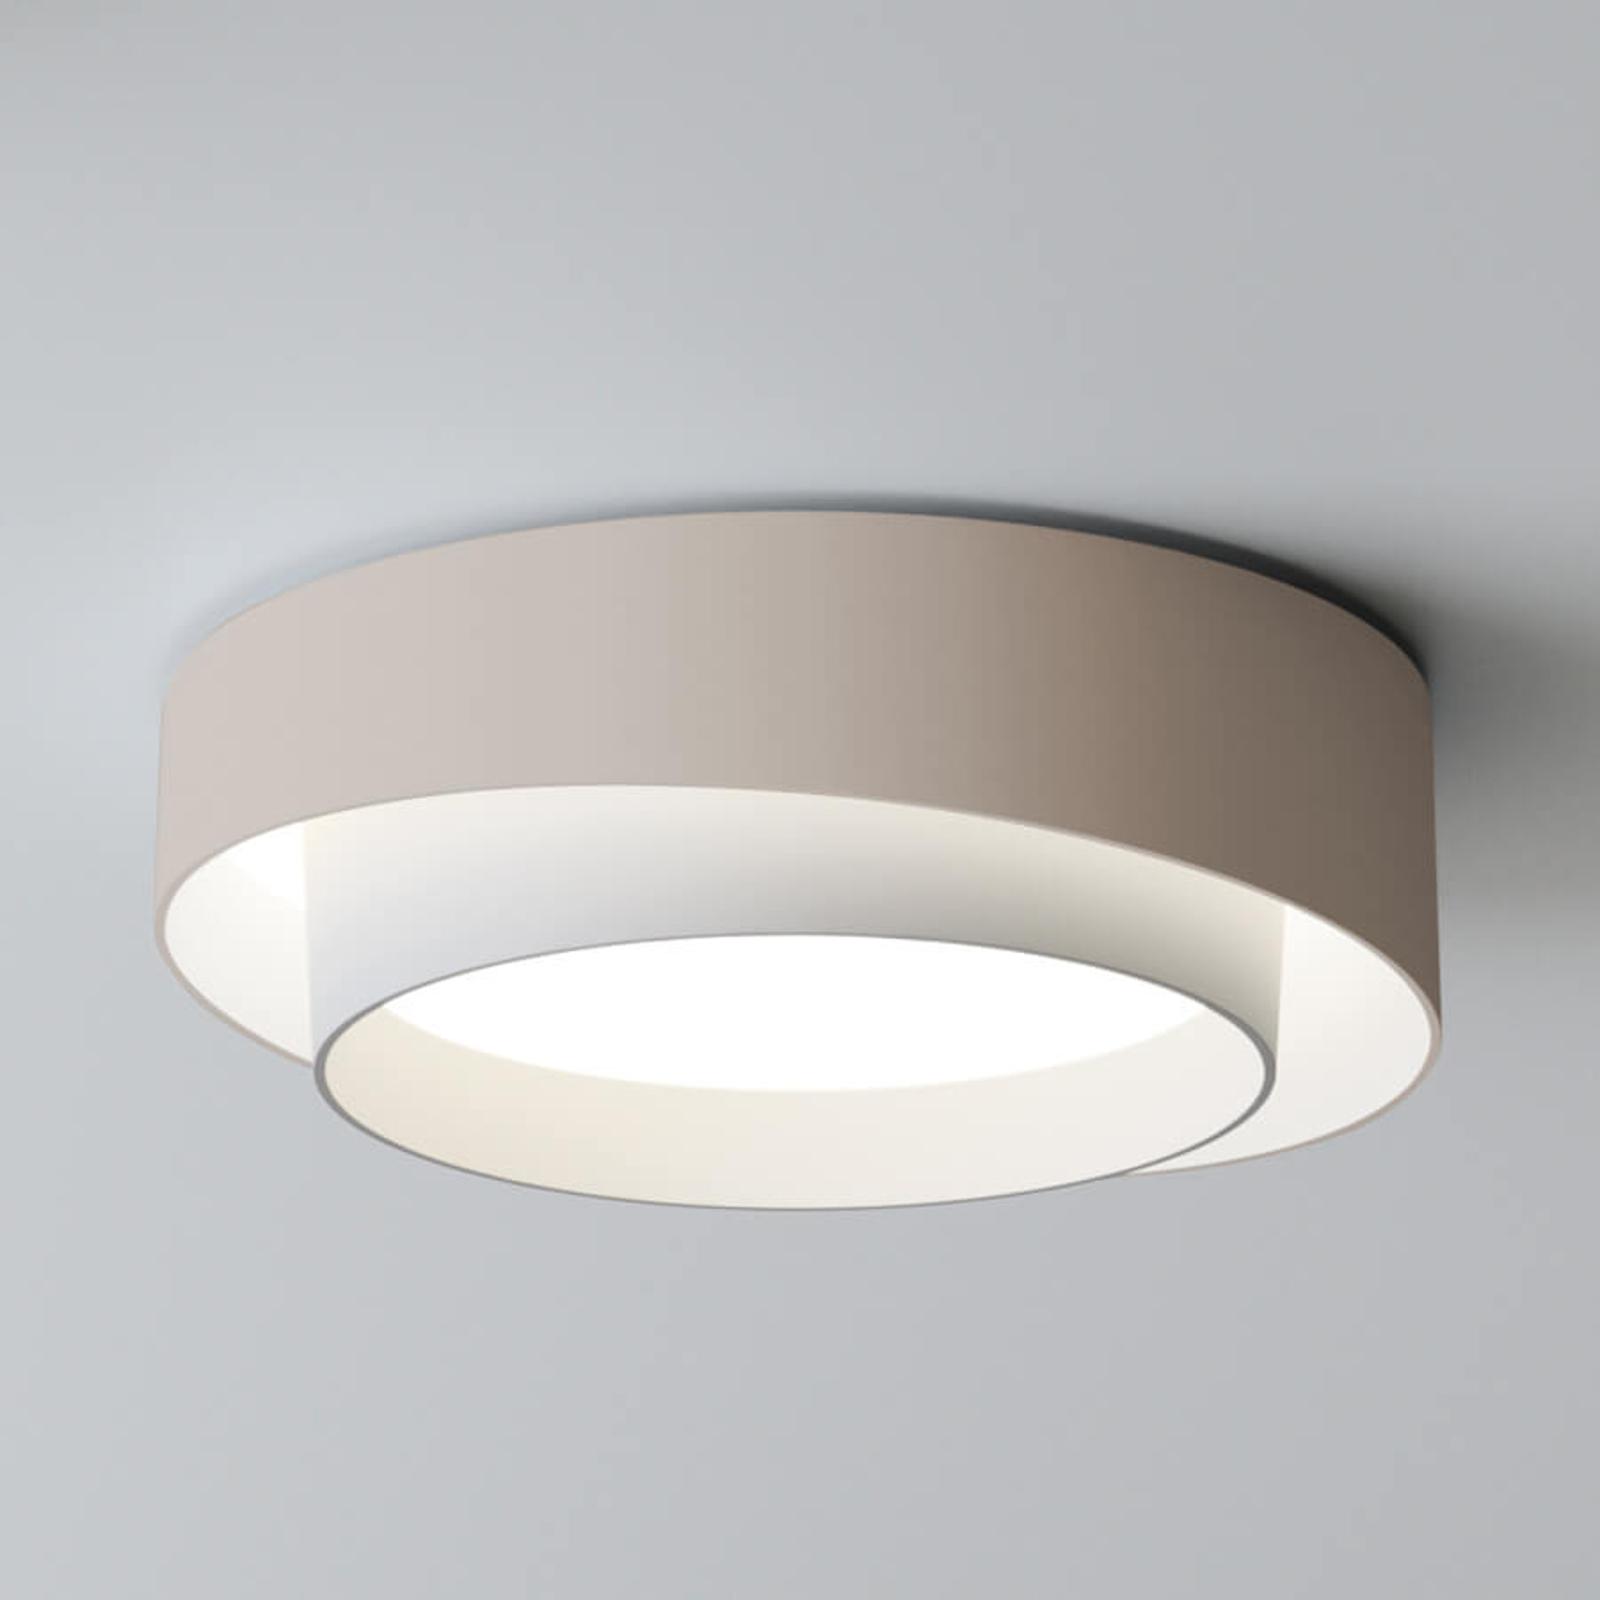 Kraftig LED loftslampe Centric, creme